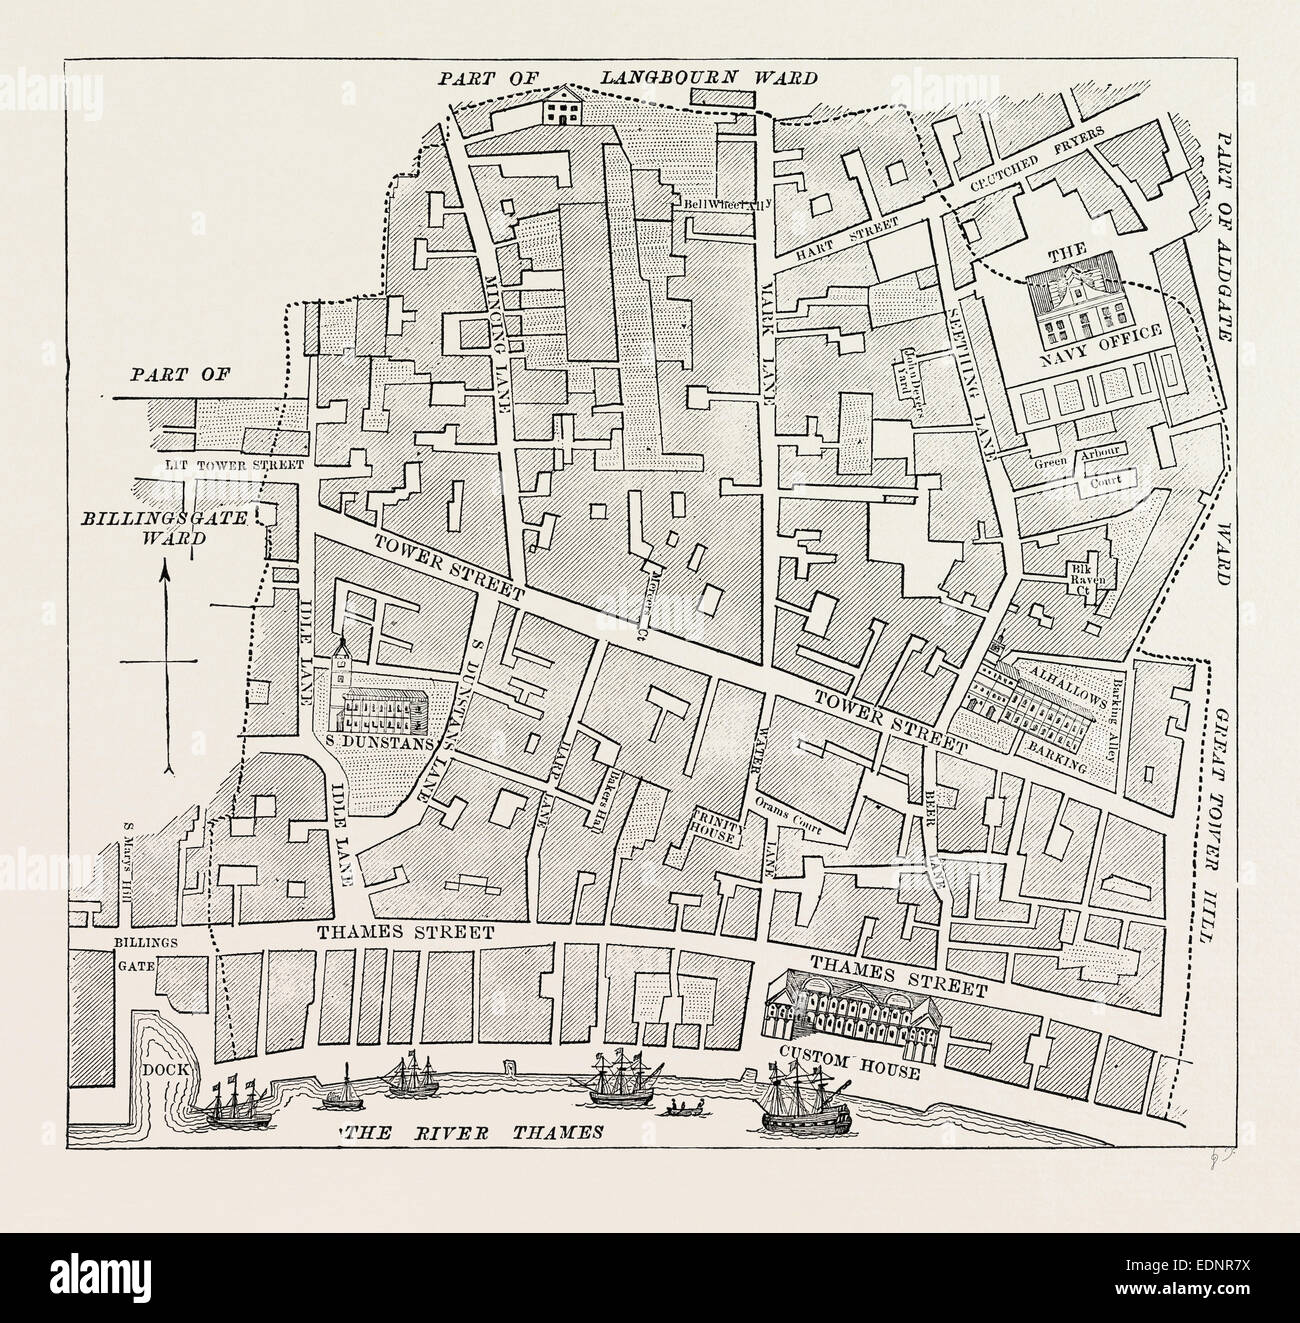 Street Map London Uk.London Street Map 19th Century Stock Photos London Street Map 19th